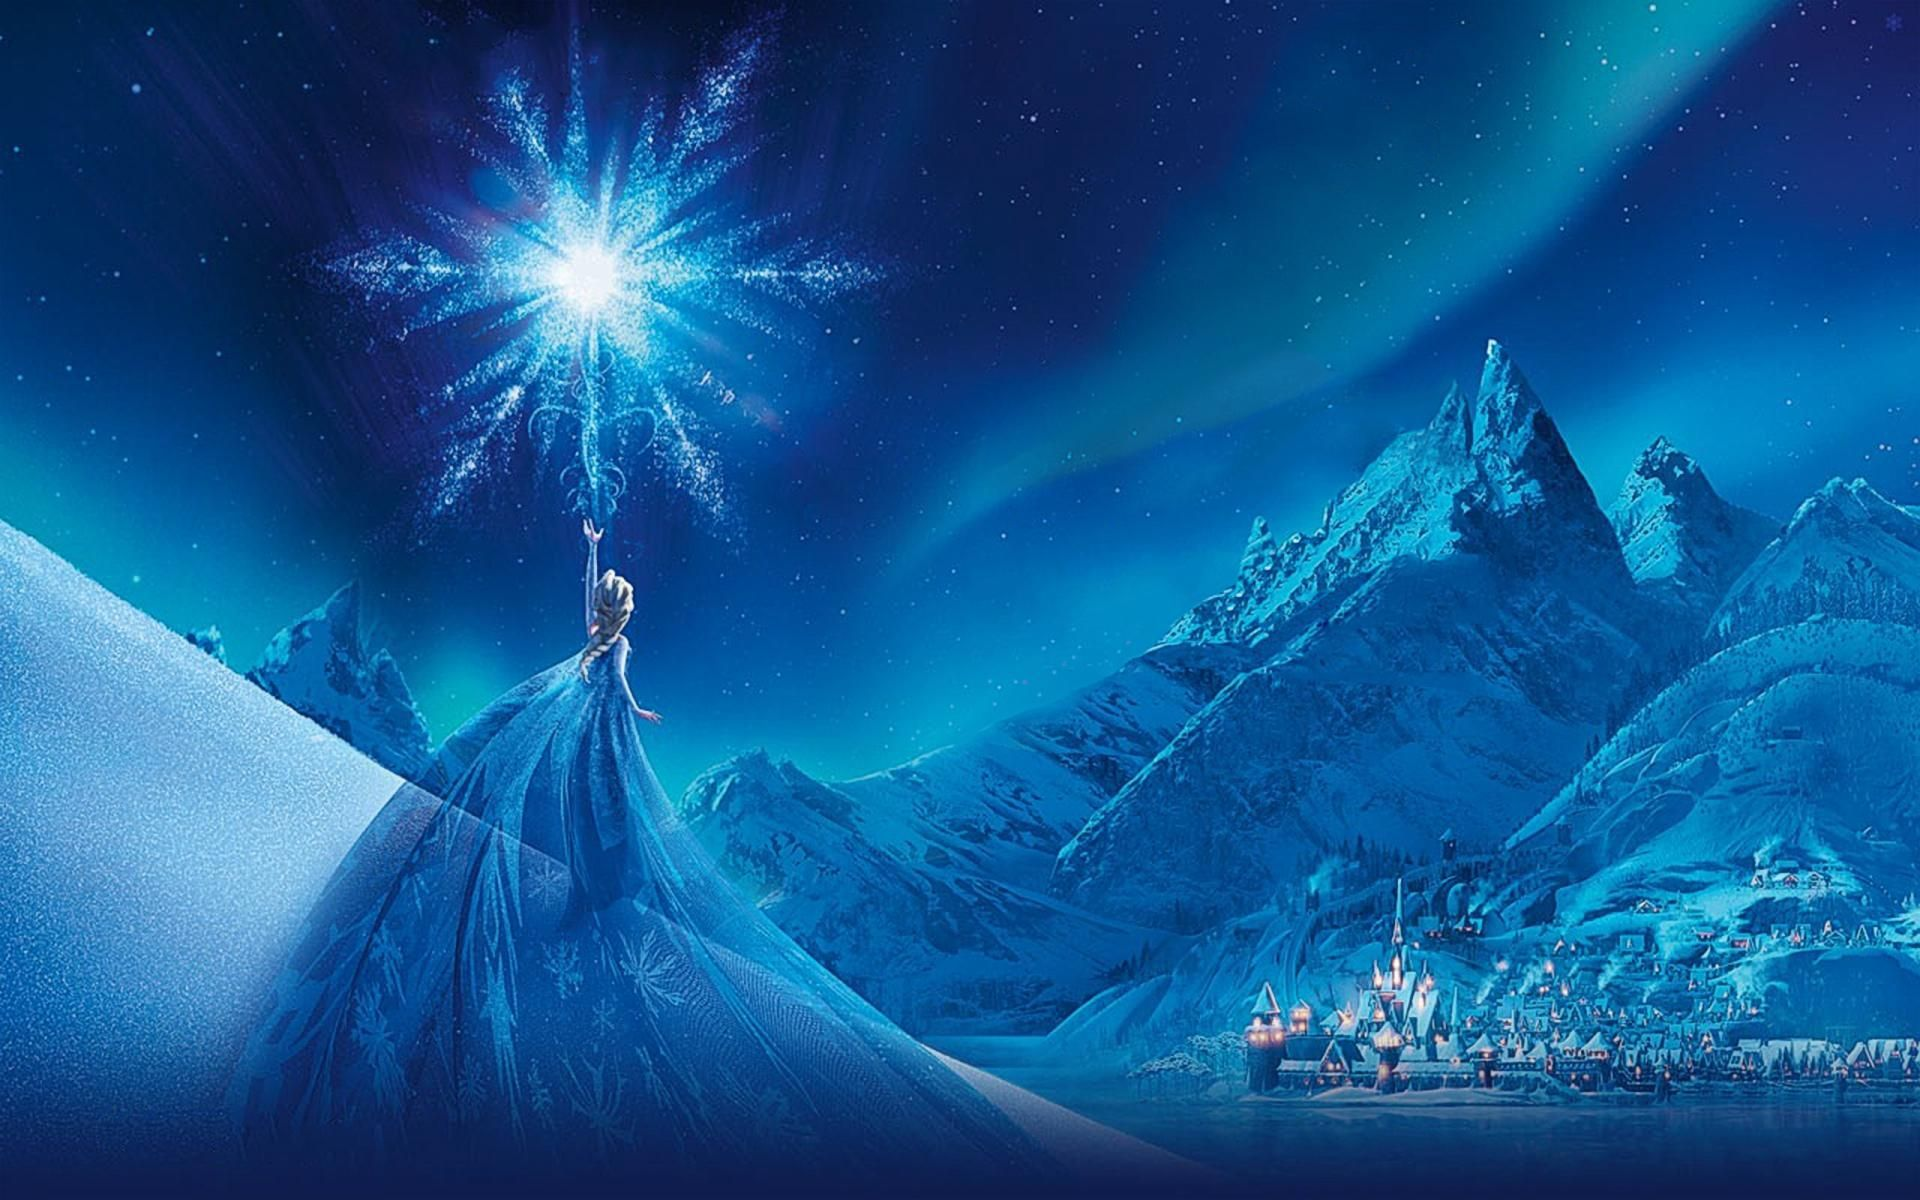 Frozember The Frozen Phenomenon Rotoscopers Frozen Images Frozen Wallpaper Disney Frozen Frozen theme wallpaper hd